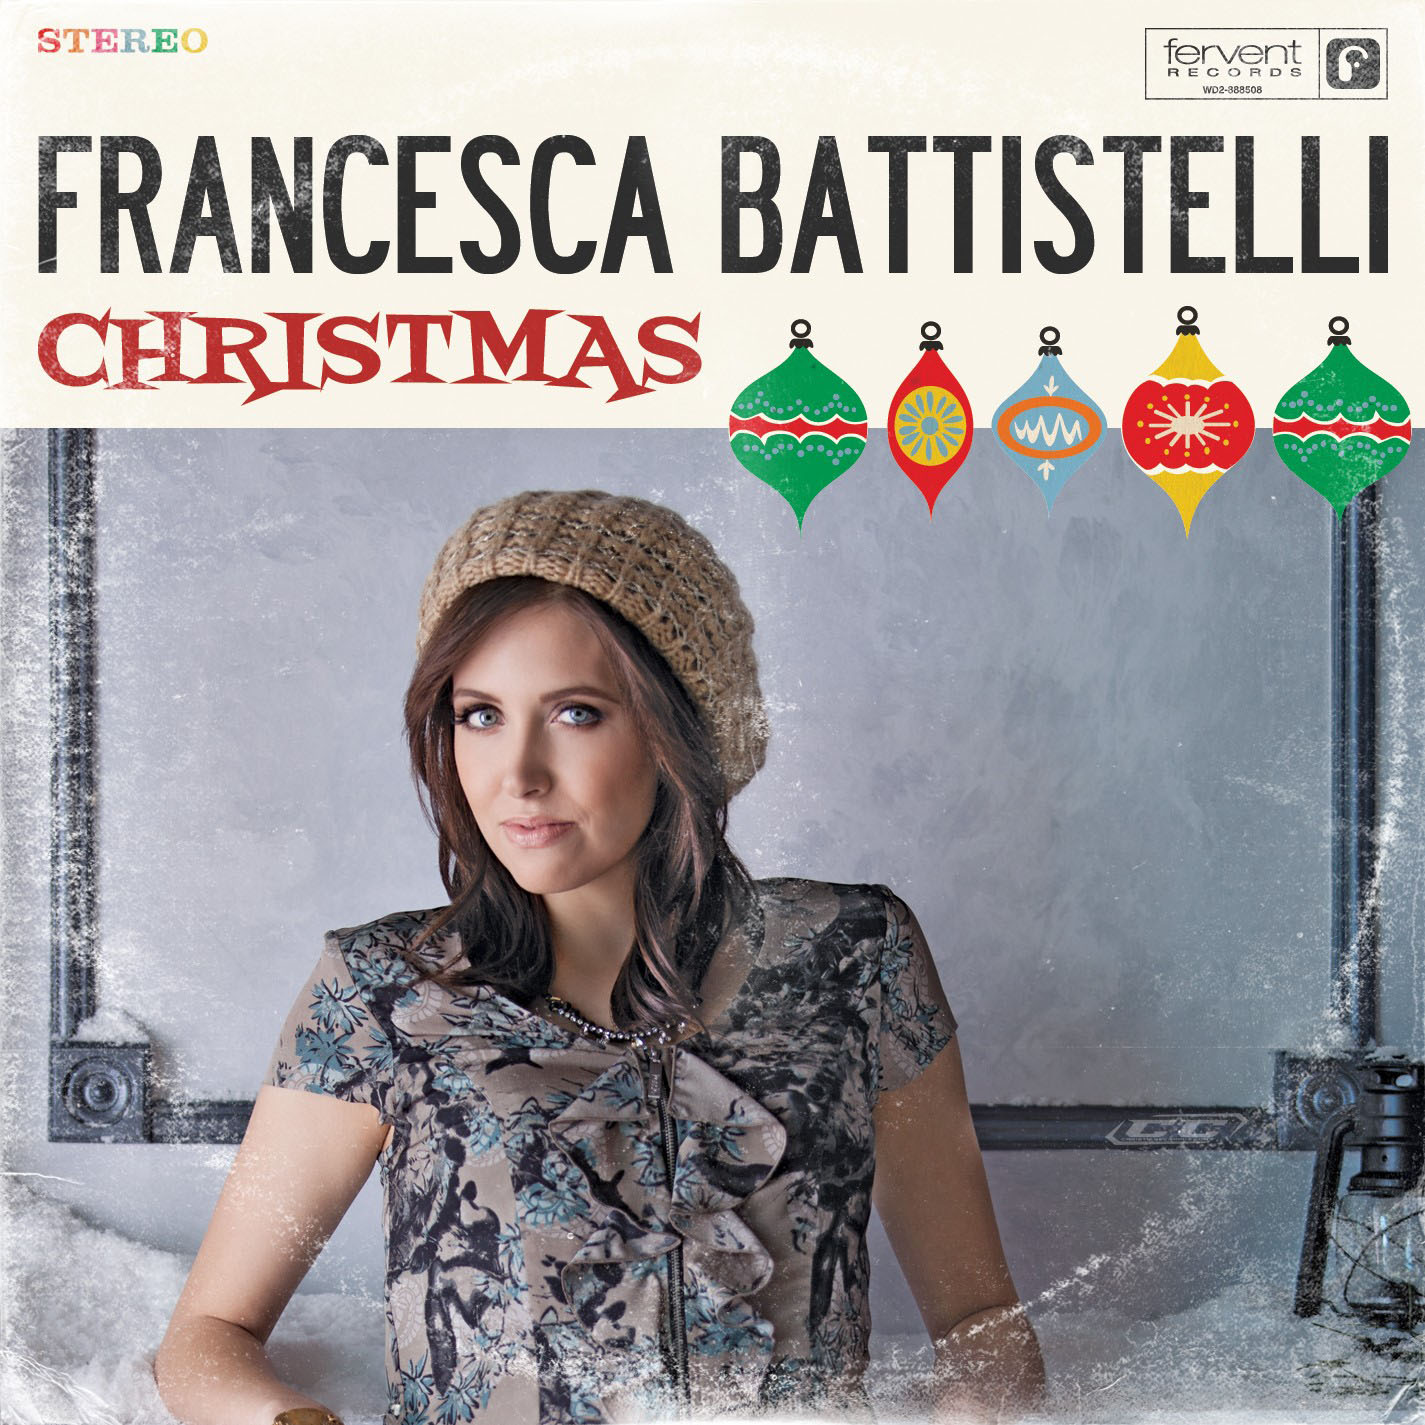 Francesca Battistelli - Christmas 2012 English Christian Christmas Album